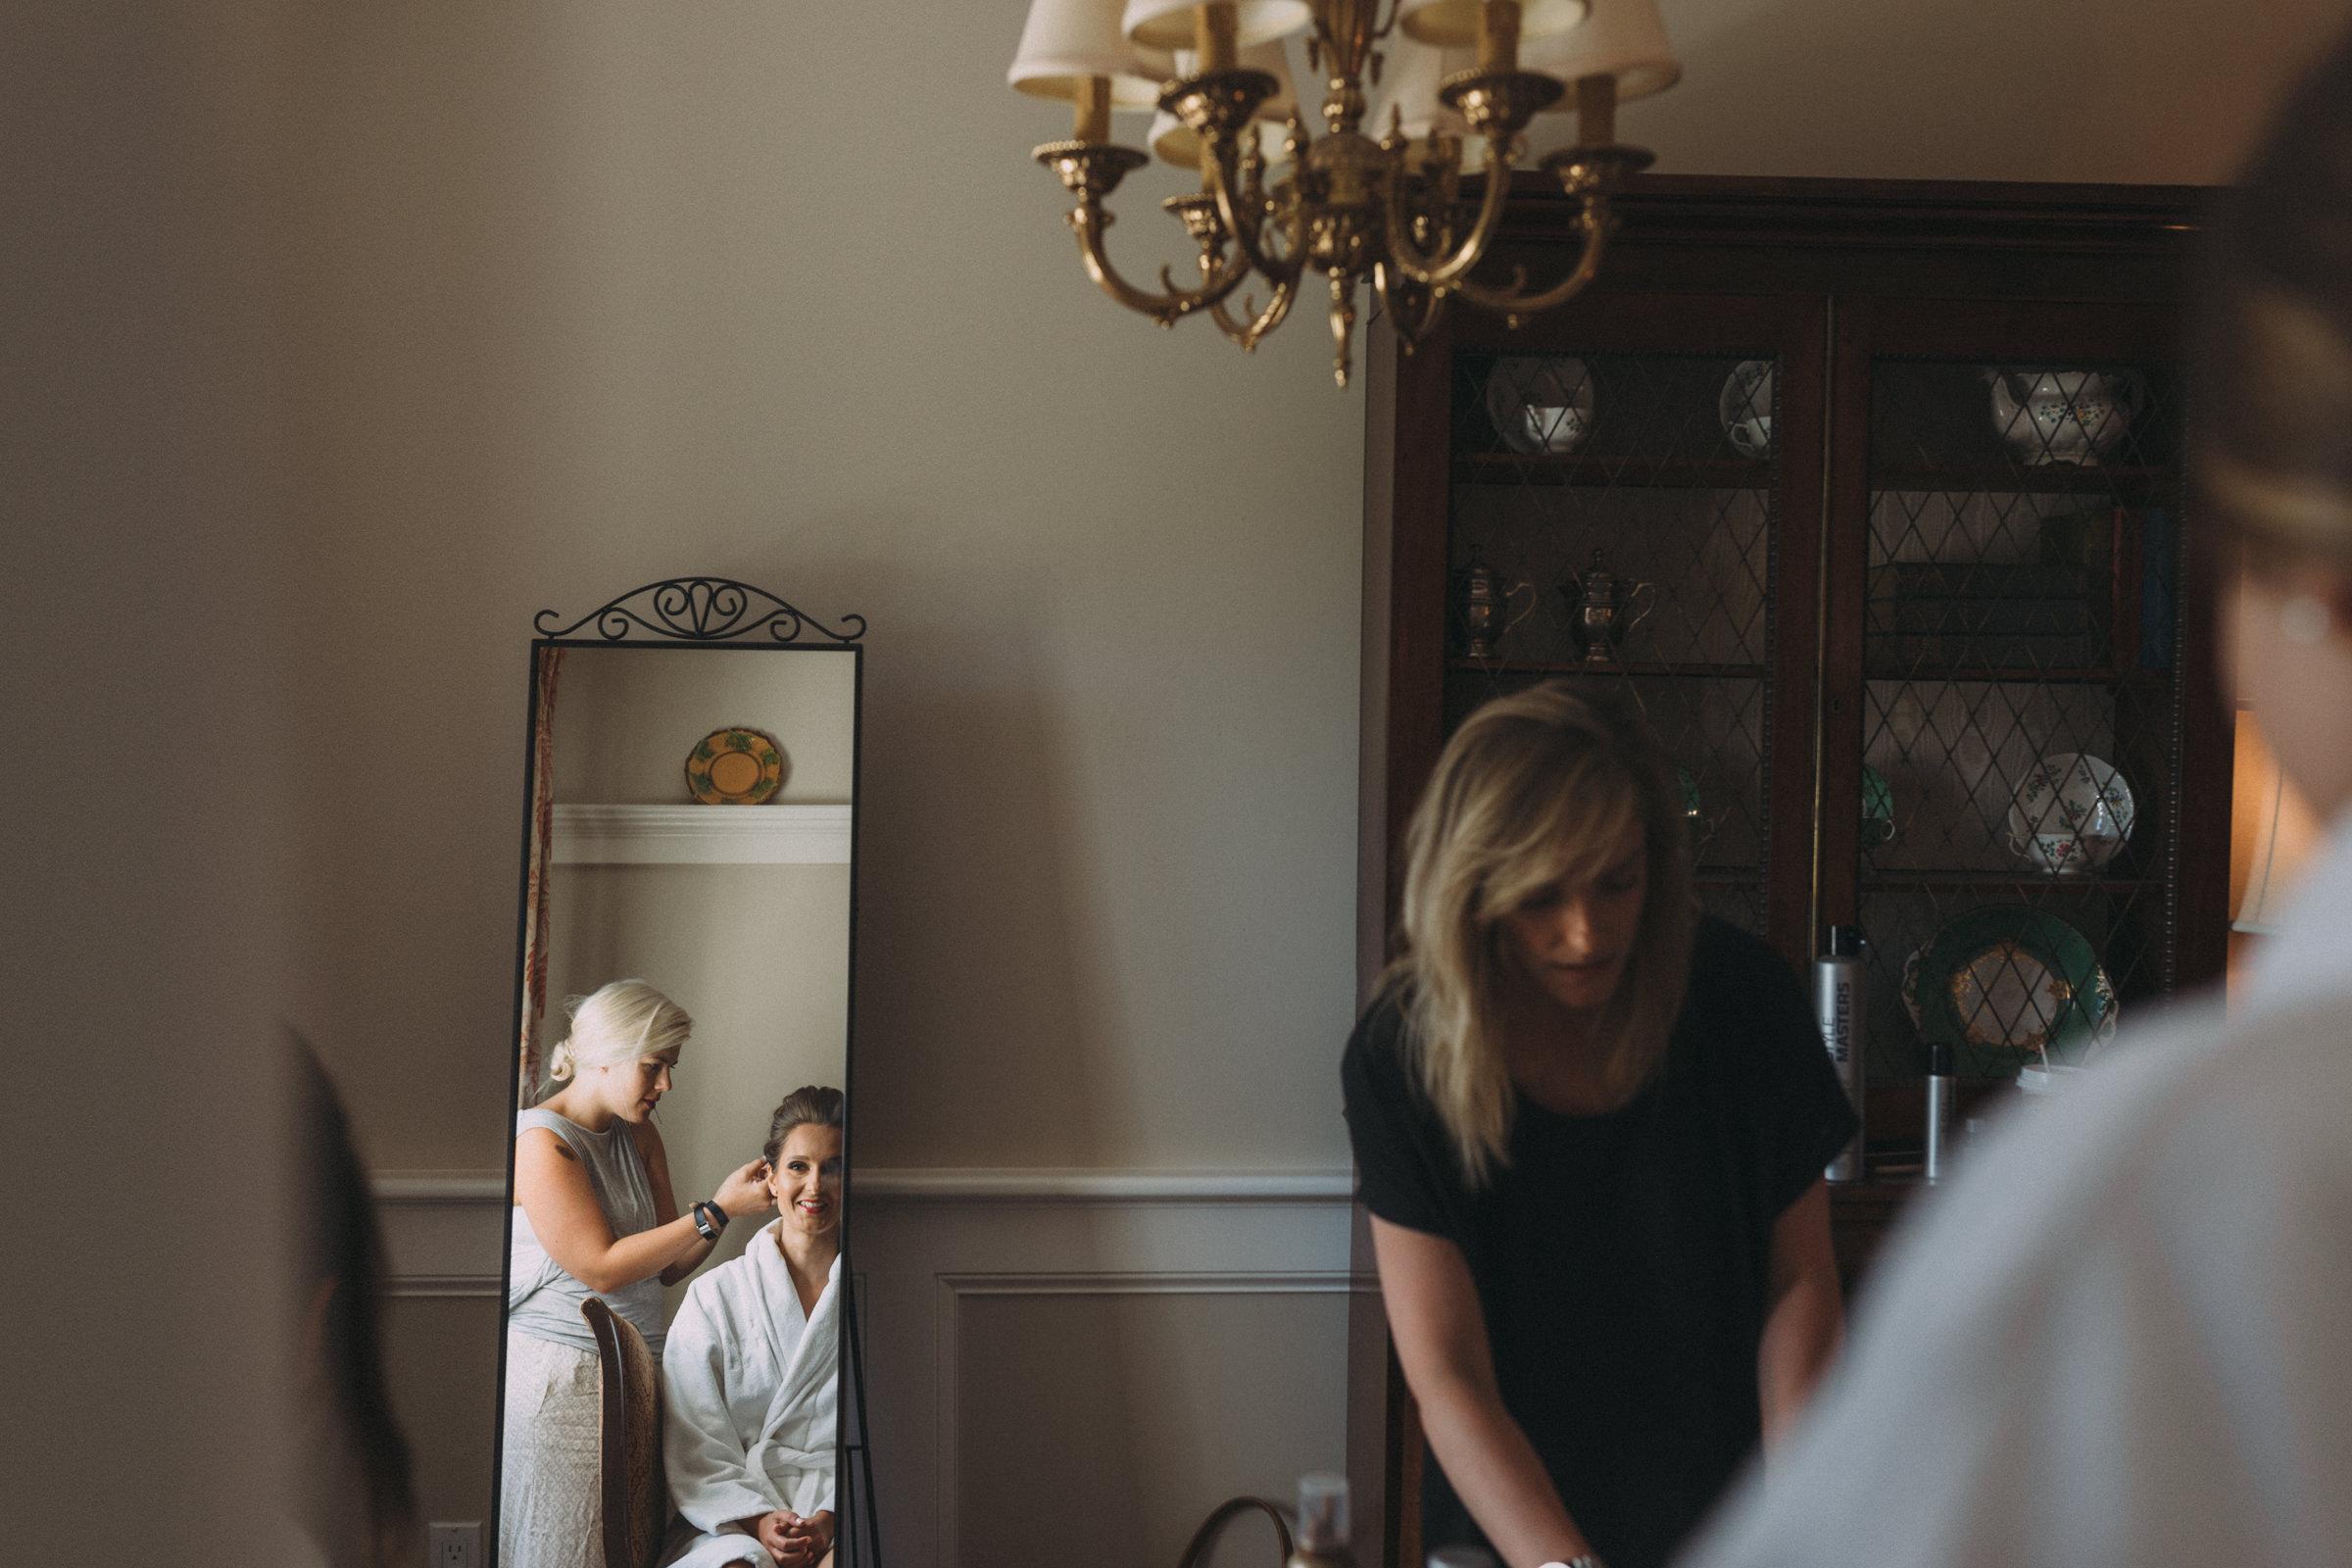 Langdon-Hall-wedding-photography-Cambridge-by-Sam-Wong-of-Visual-Cravings_Sarah-Ryan_03.jpg